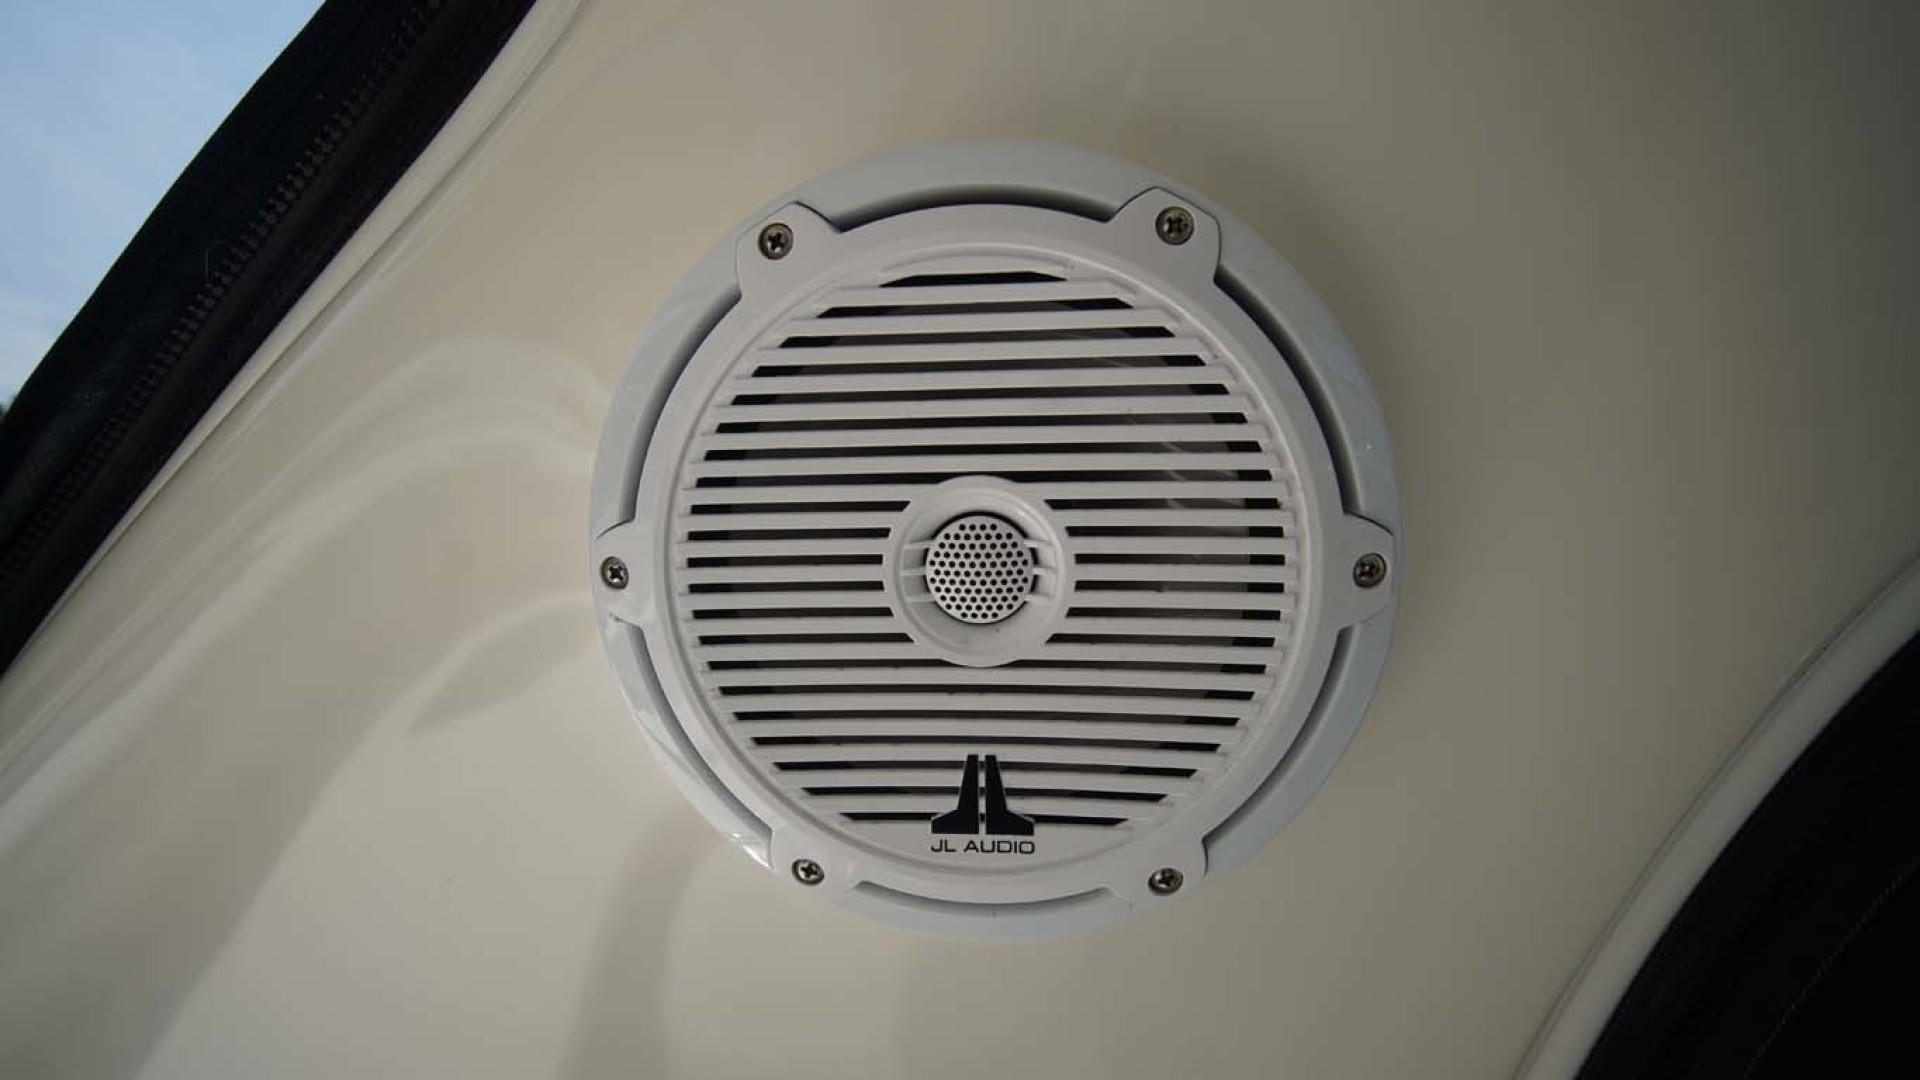 Sea Ray-Sundancer 2006-Late Fee Destin-Florida-United States-JL Audio Speakers-1125987 | Thumbnail